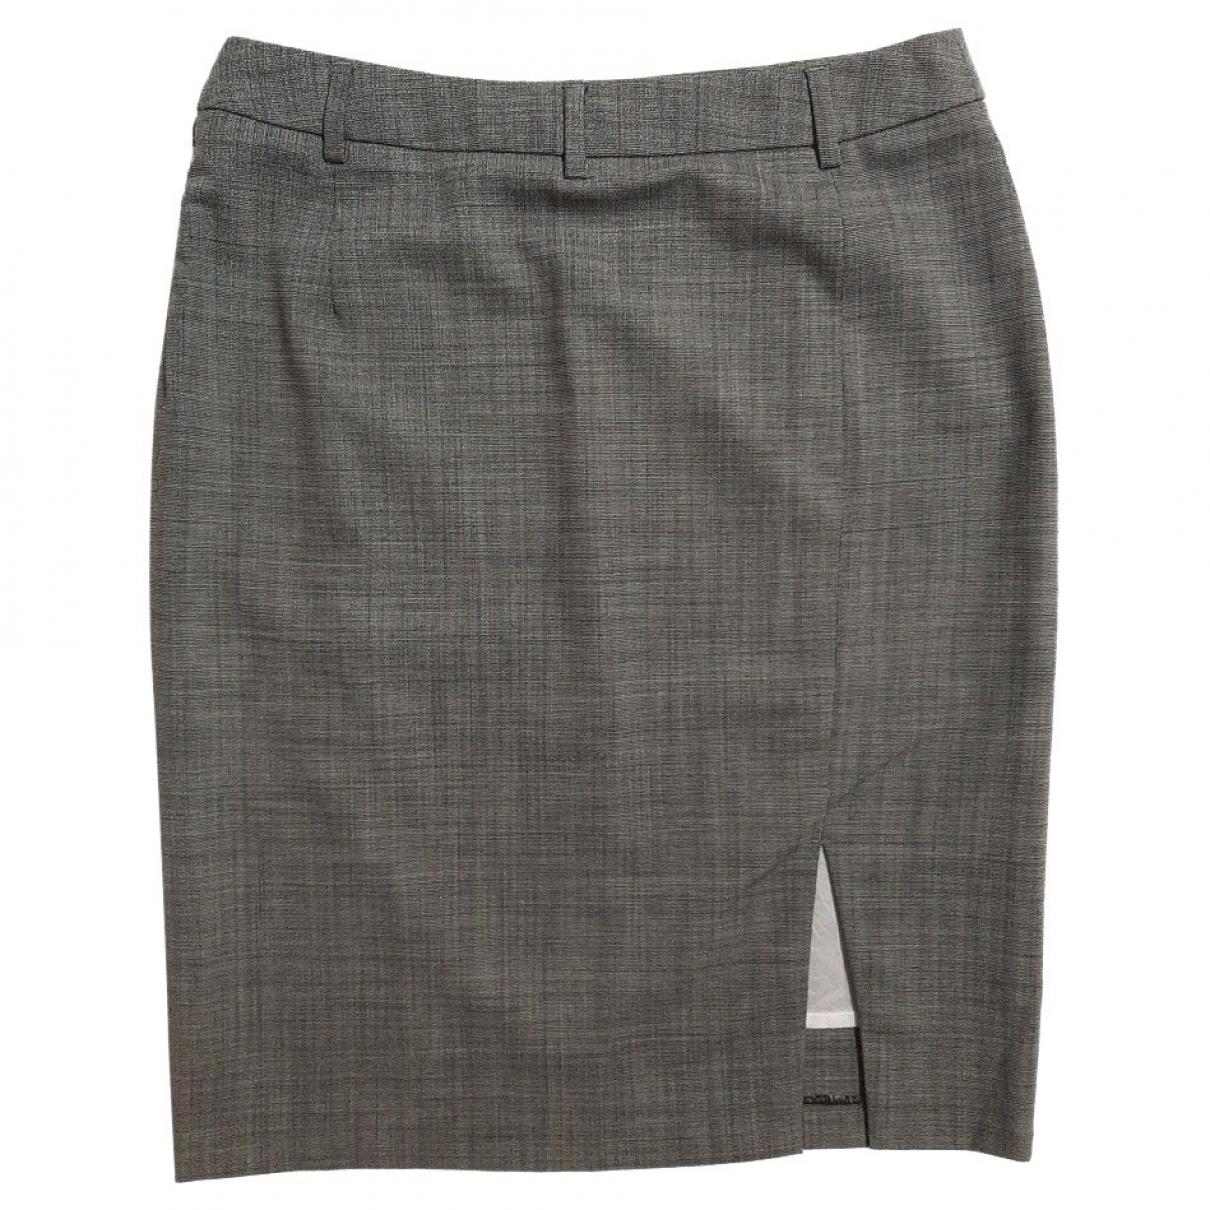 Mini falda de Lana Paul Smith